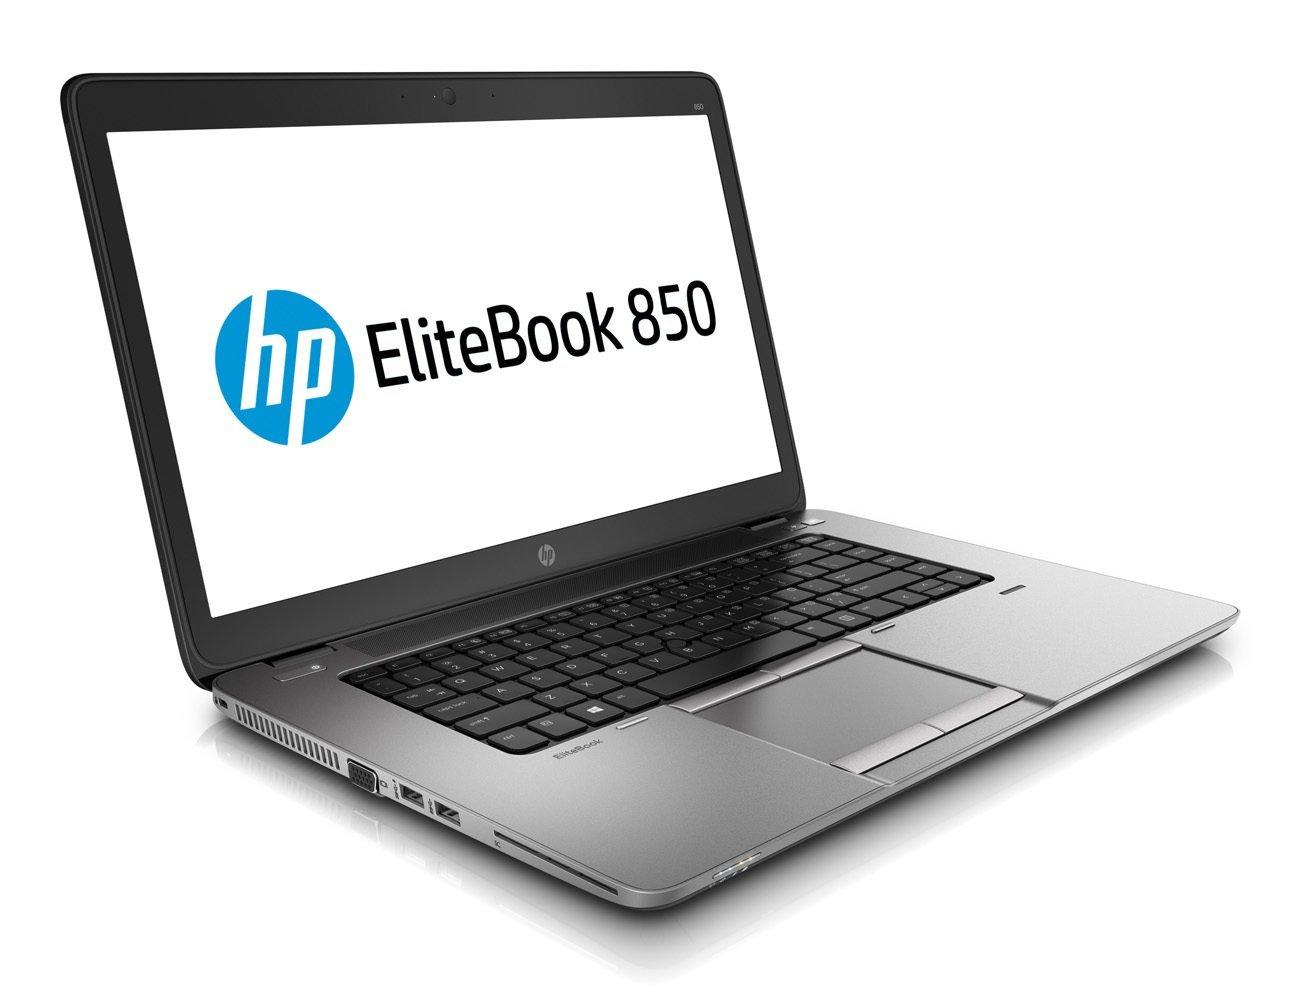 HP EliteBook 850 G1 15,6 Zoll 1920x1080 Full HD Intel Core i5 512GB SSD Festplatte 8GB Speicher Win 10 Pro Webcam Tastaturbeleuchtung G6K68EC Notebook Laptop (Zertifiziert und Generalüberholt)